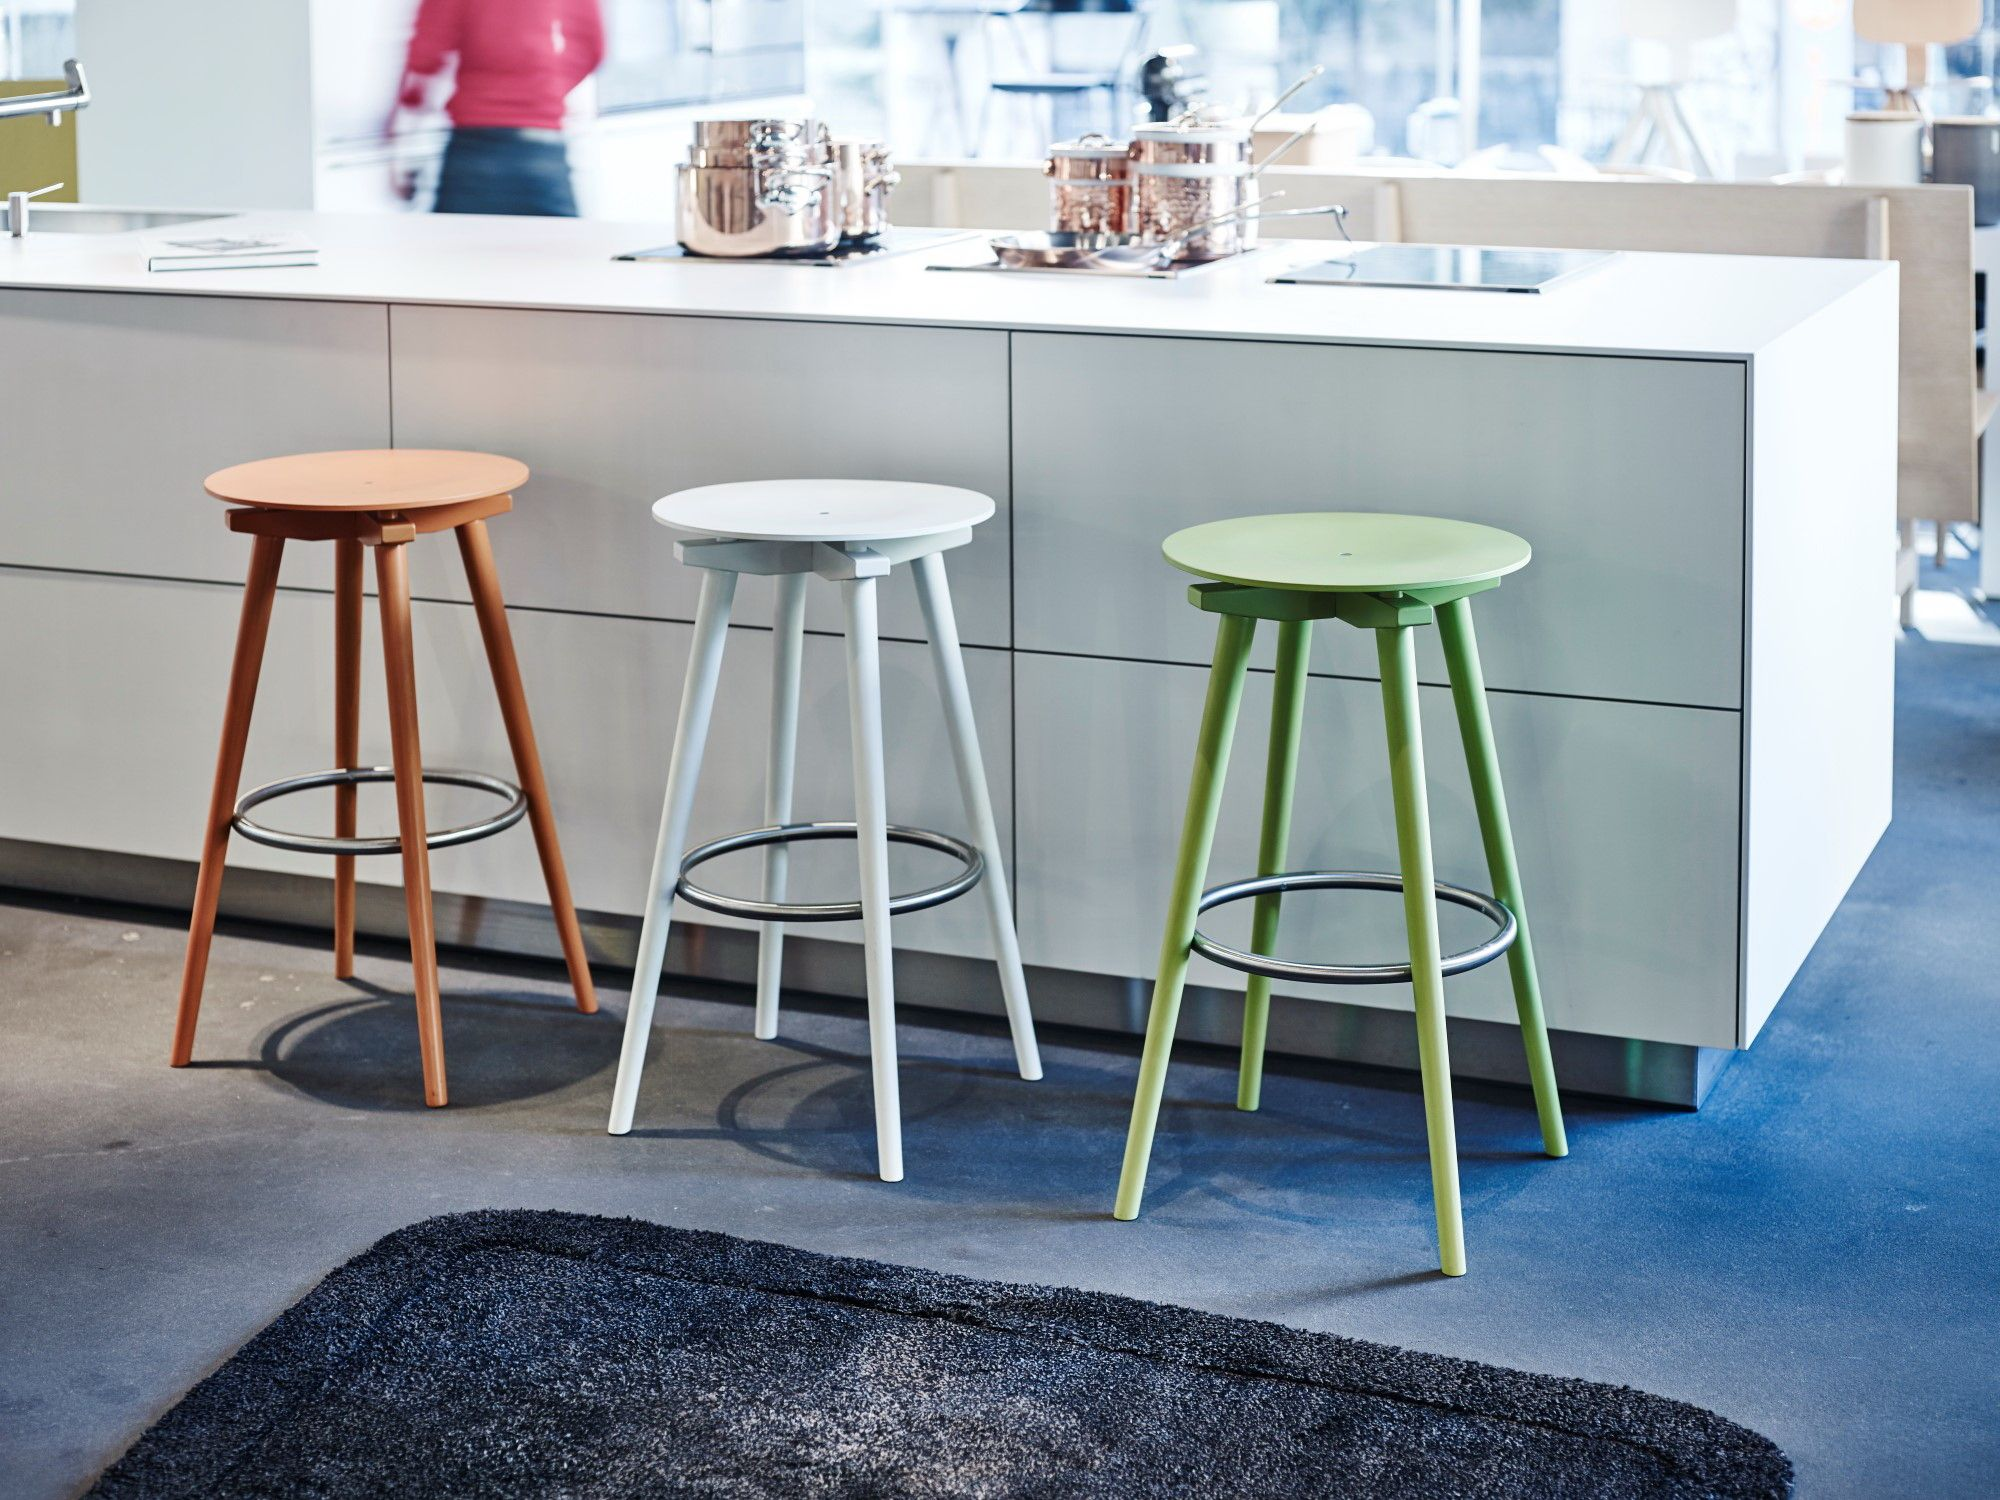 Bar stool CC | Bar stool, Stools and Kitchen island bar